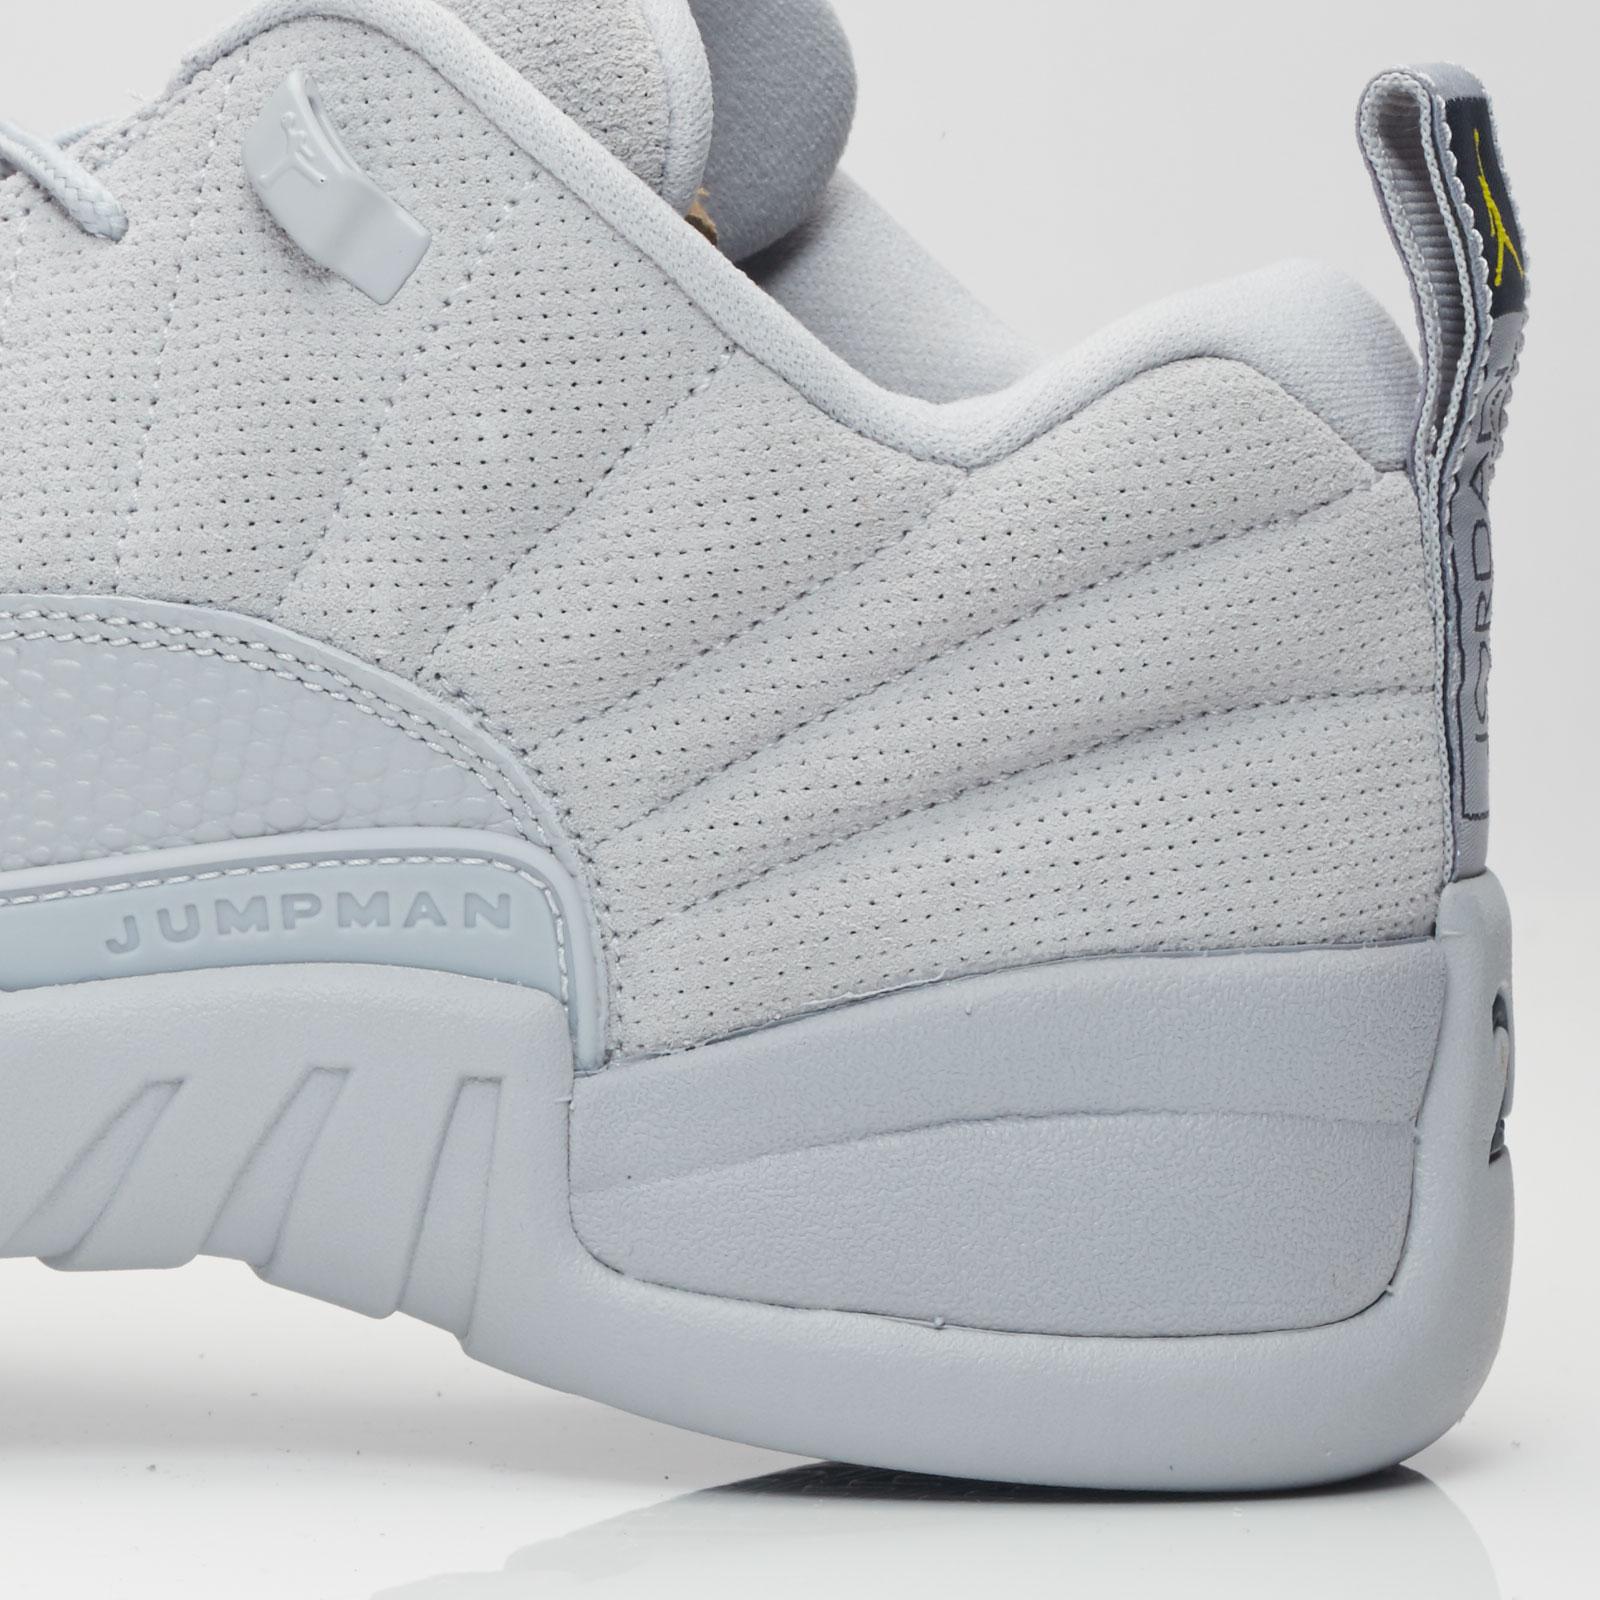 competitive price 59b42 57a72 Jordan Brand Air Jordan 12 Retro Low - 308317-002 - Sneakersnstuff    sneakers   streetwear online since 1999